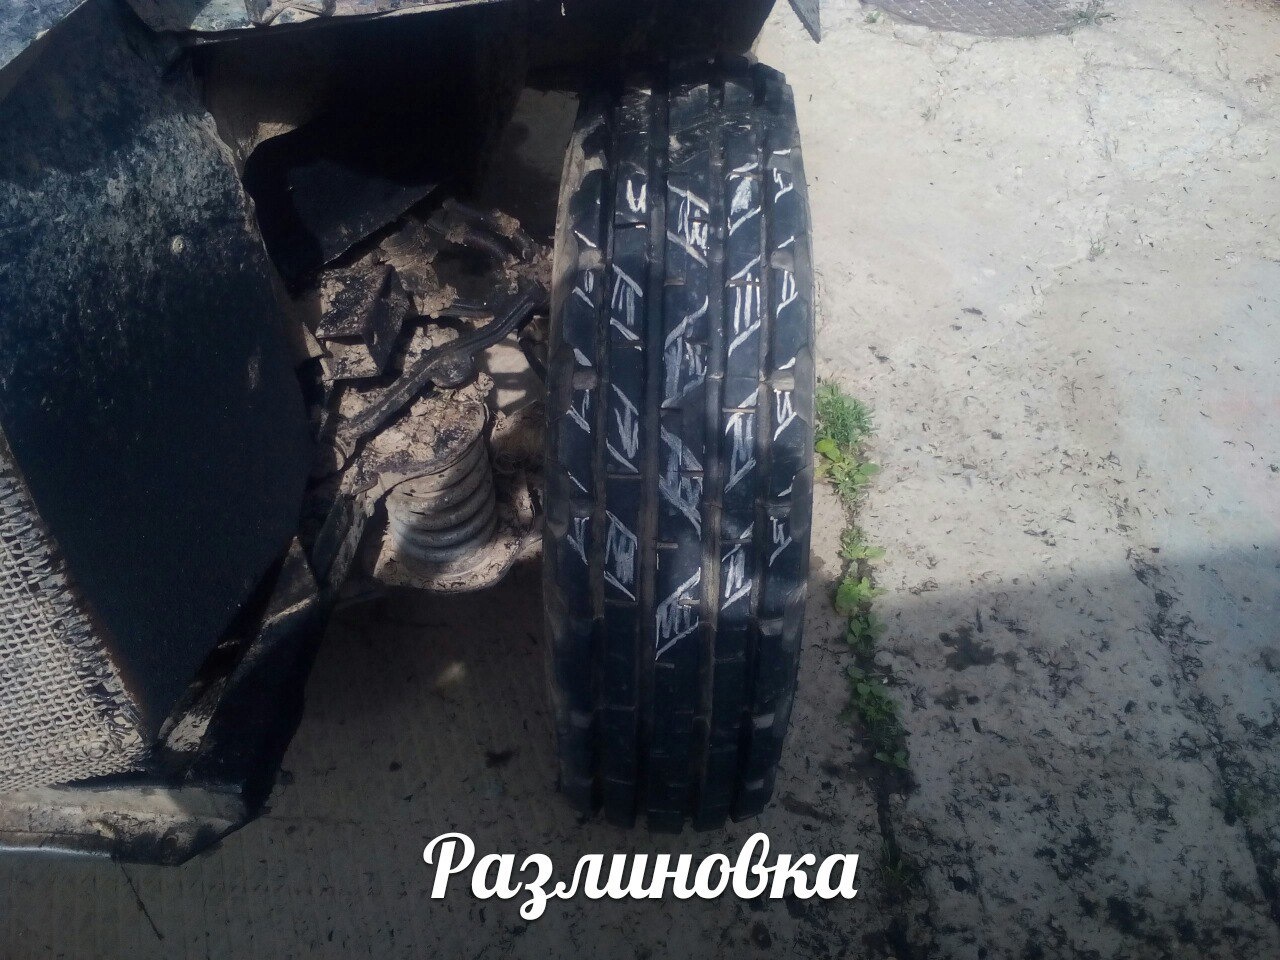 фото схеме московского метрополитена